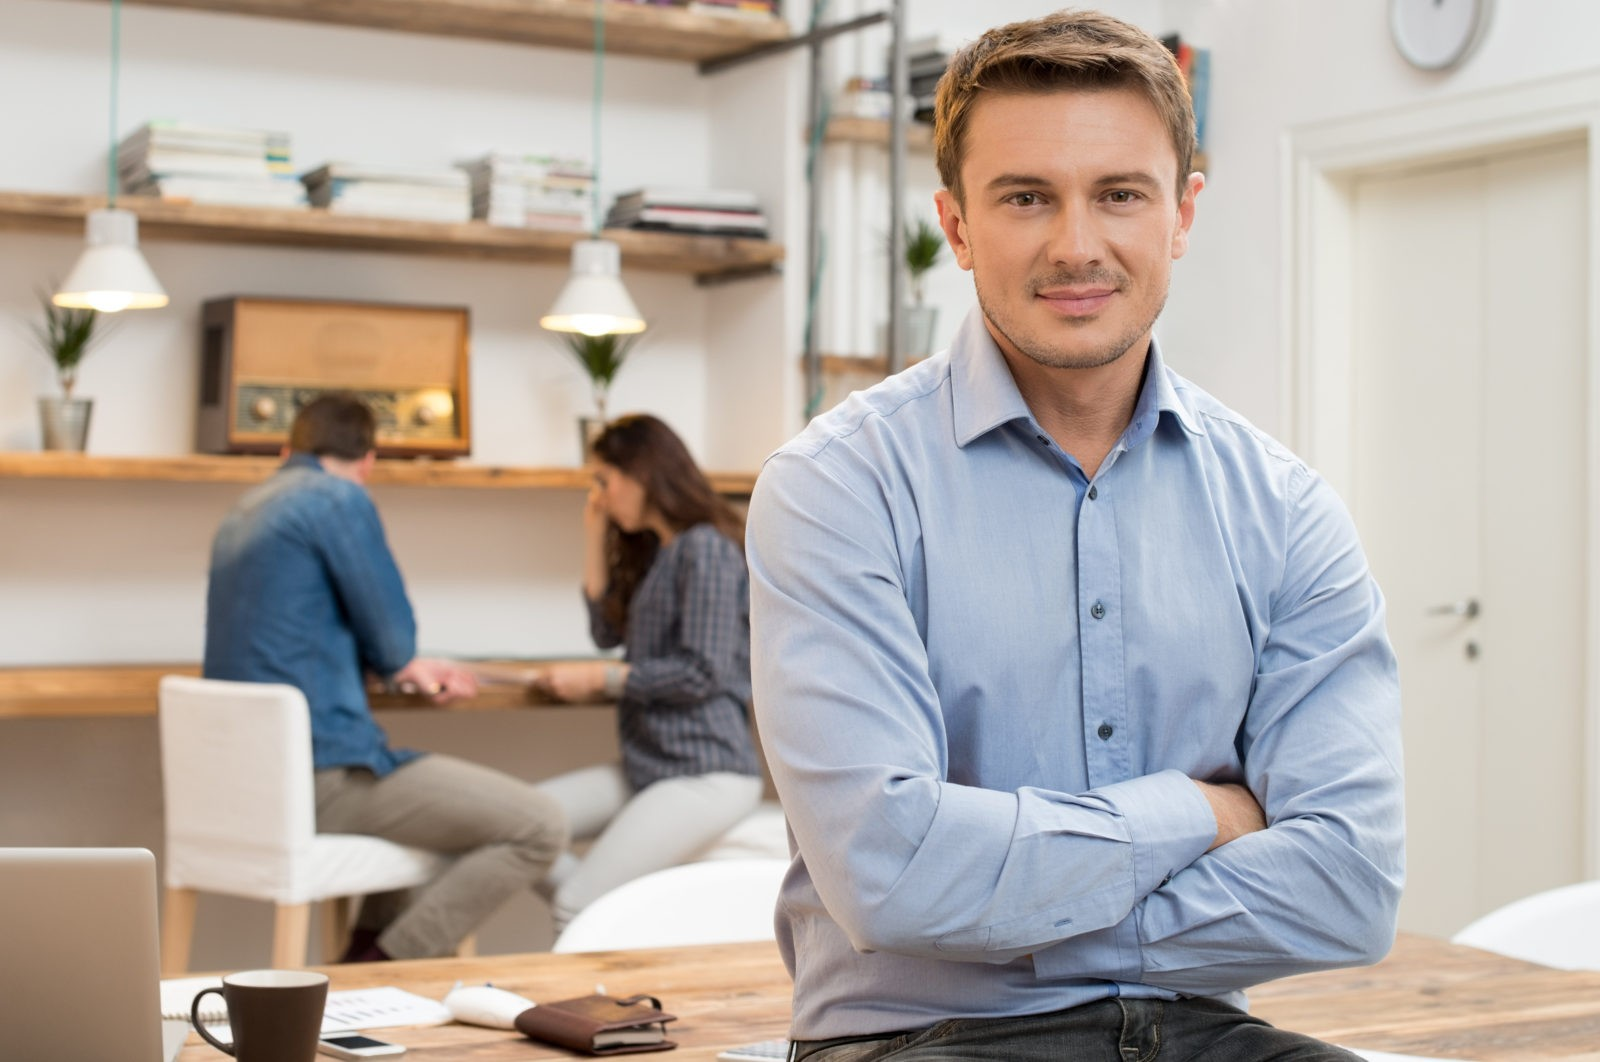 Employee Benefits: The Benefit of Benefits